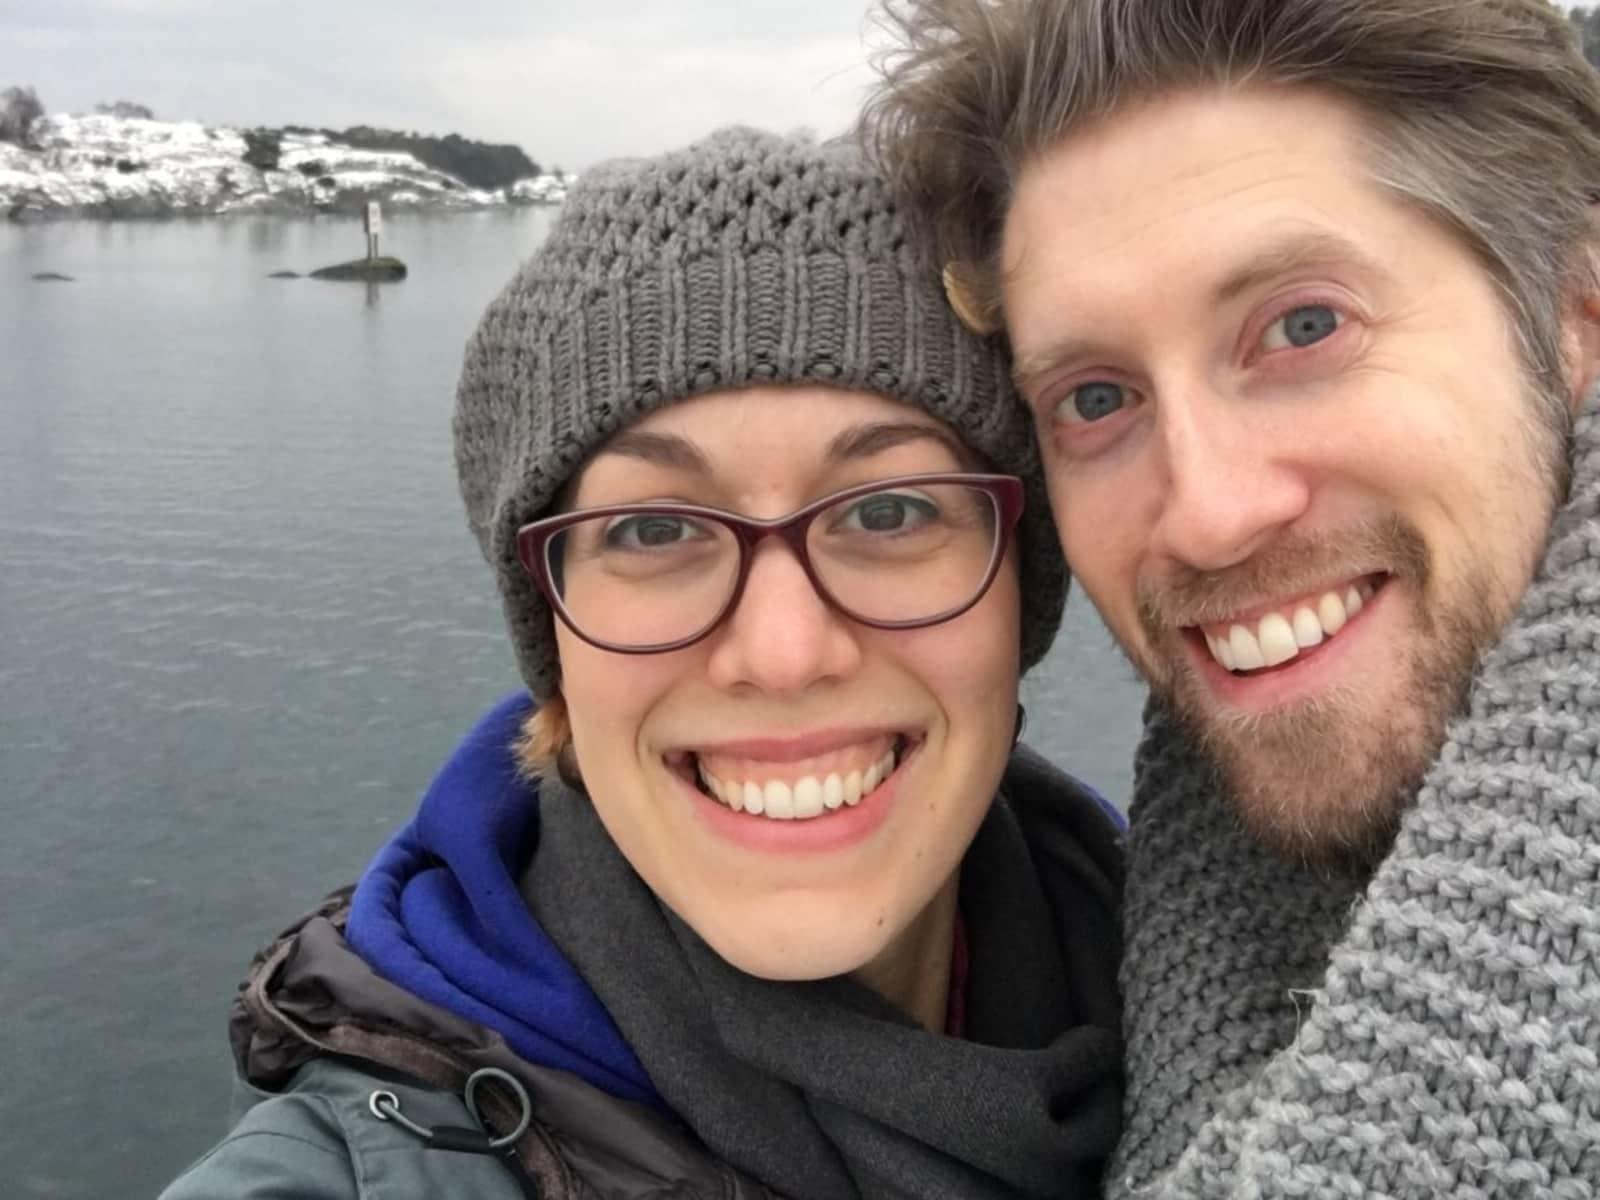 Janice & Matt from Halifax, Nova Scotia, Canada